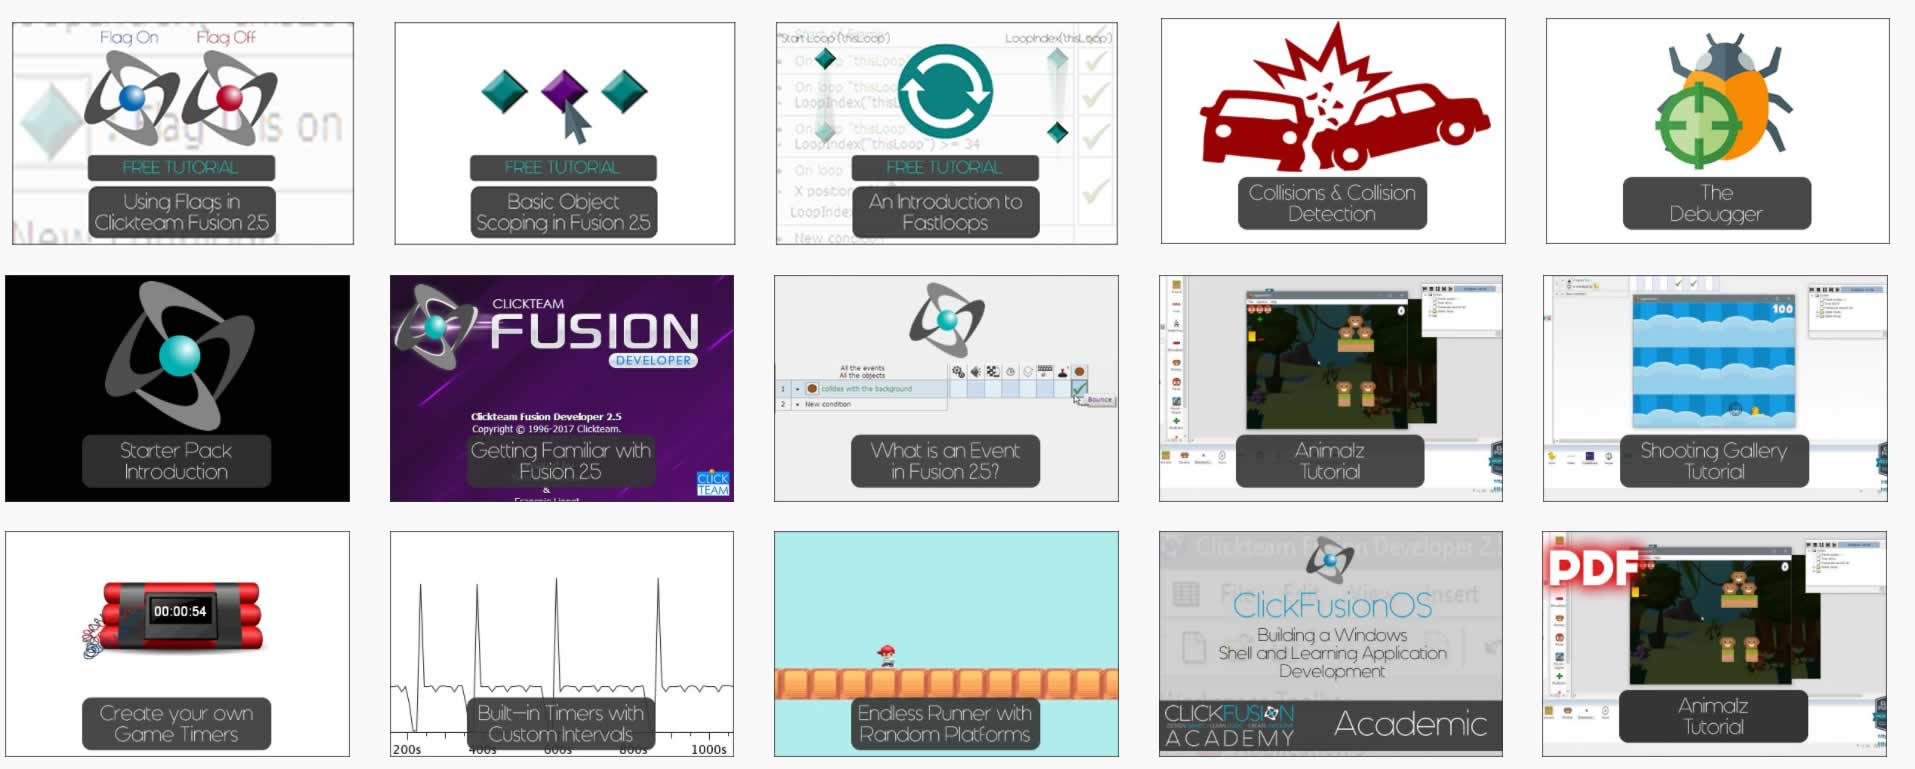 clickteam-fusion-tutorials-10